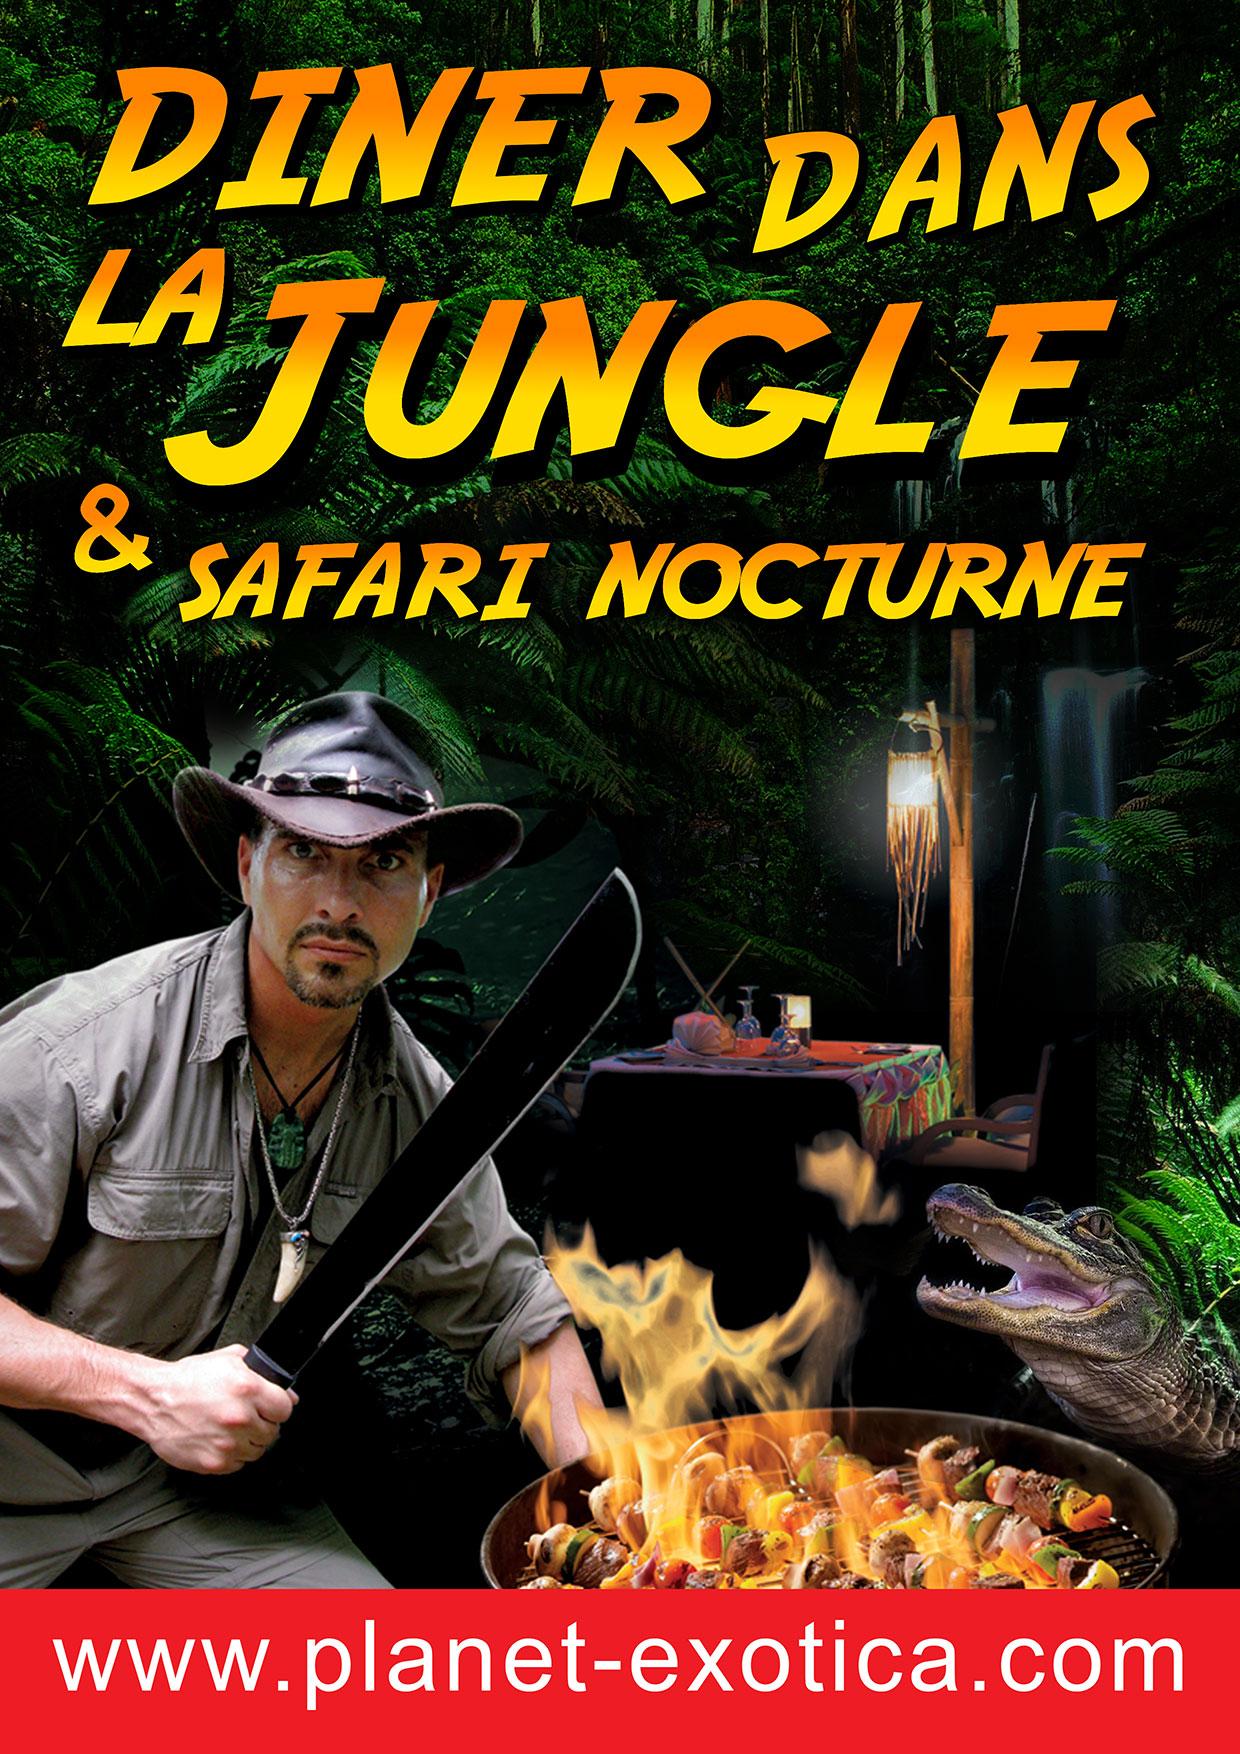 27. Fév. 2015 – Dîner dans la Jungle & Safari nocturne